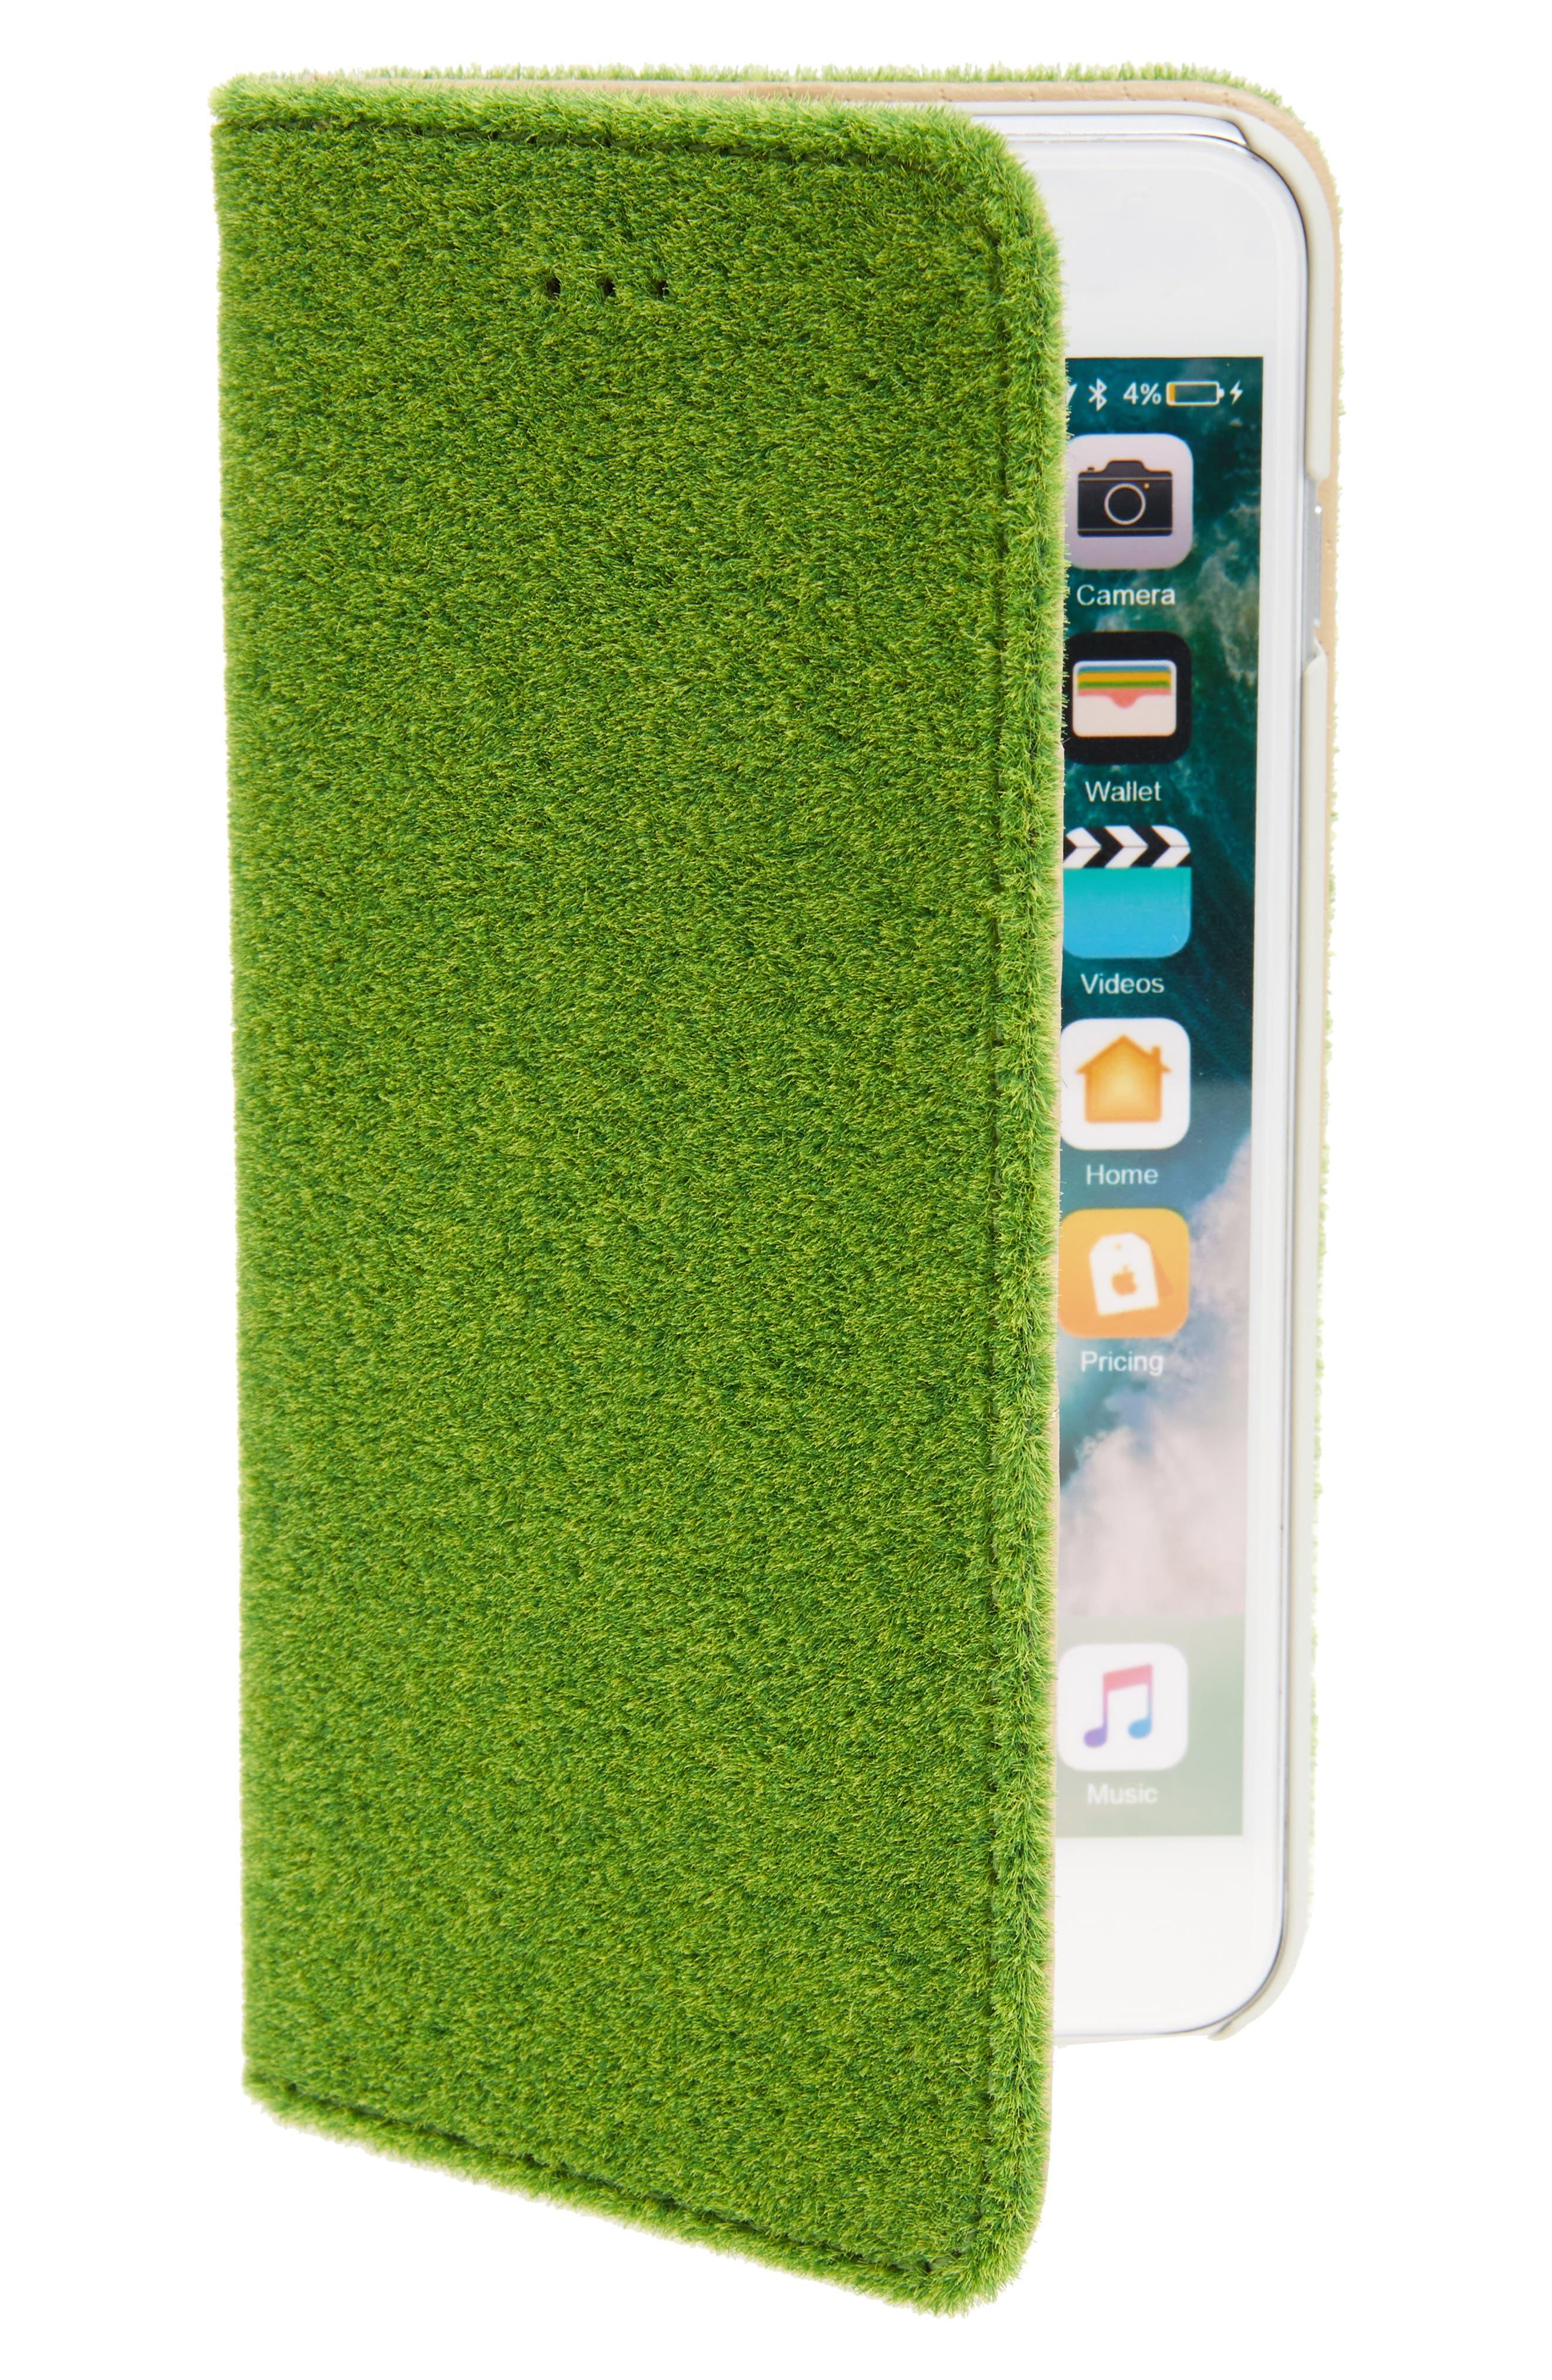 Portable Yoyogi Park iPhone 7 & iPhone 7 Plus Flip Cover Case,                             Main thumbnail 1, color,                             301